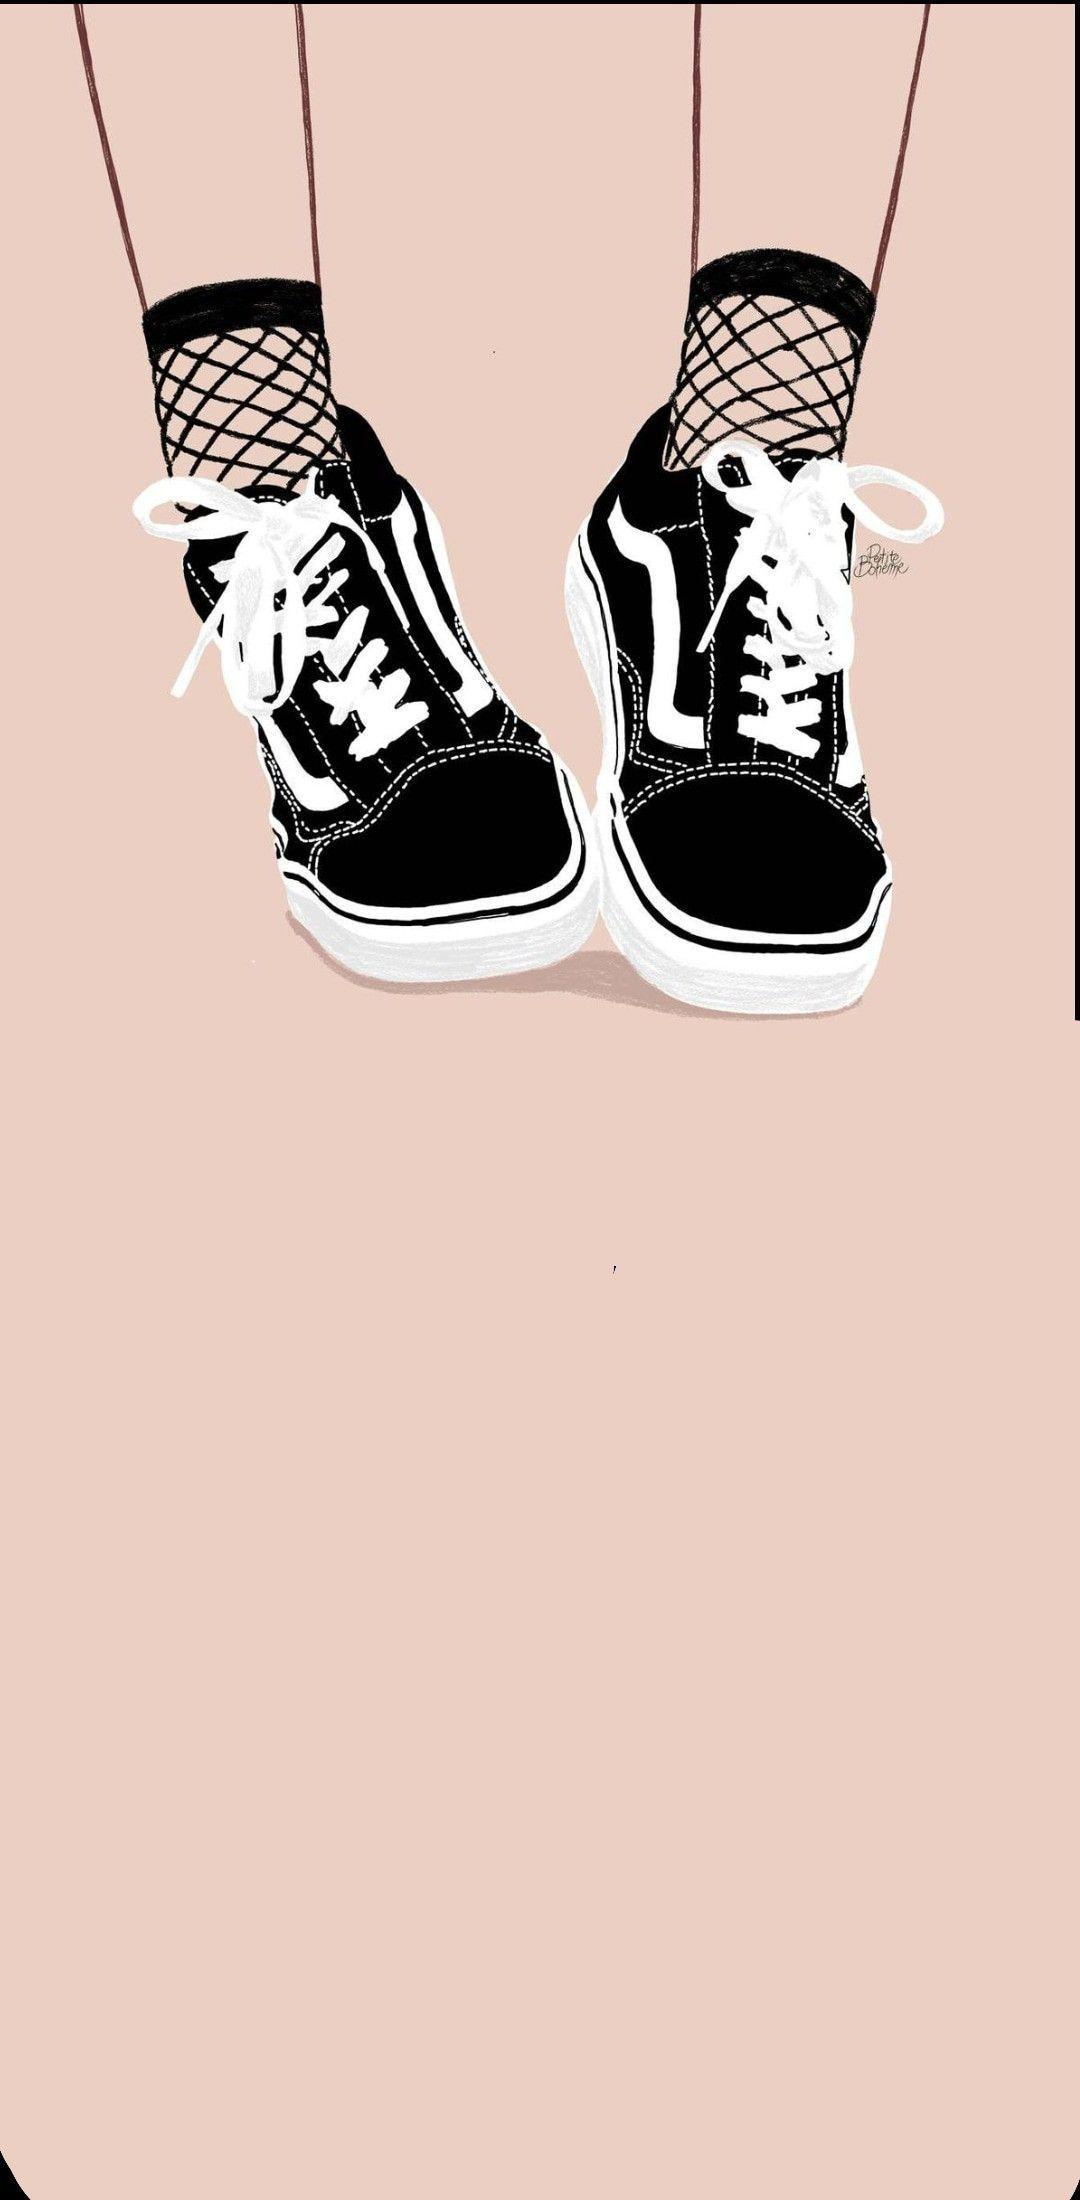 Pin By Shahd Sherif On Art Cute Tumblr Wallpaper